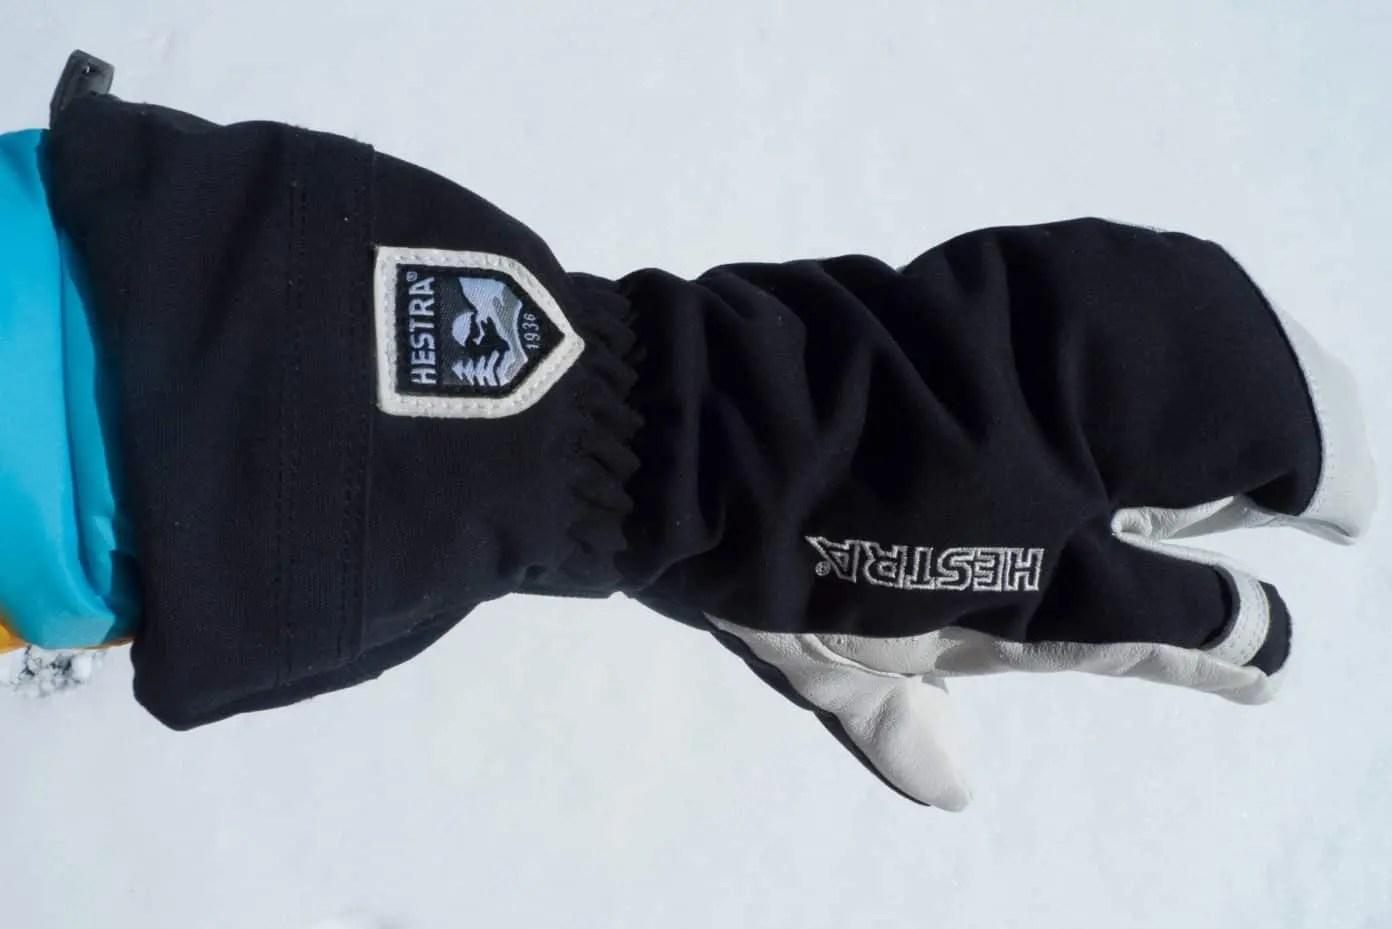 Hestra Army Leather Heli 3 finger Glove, black